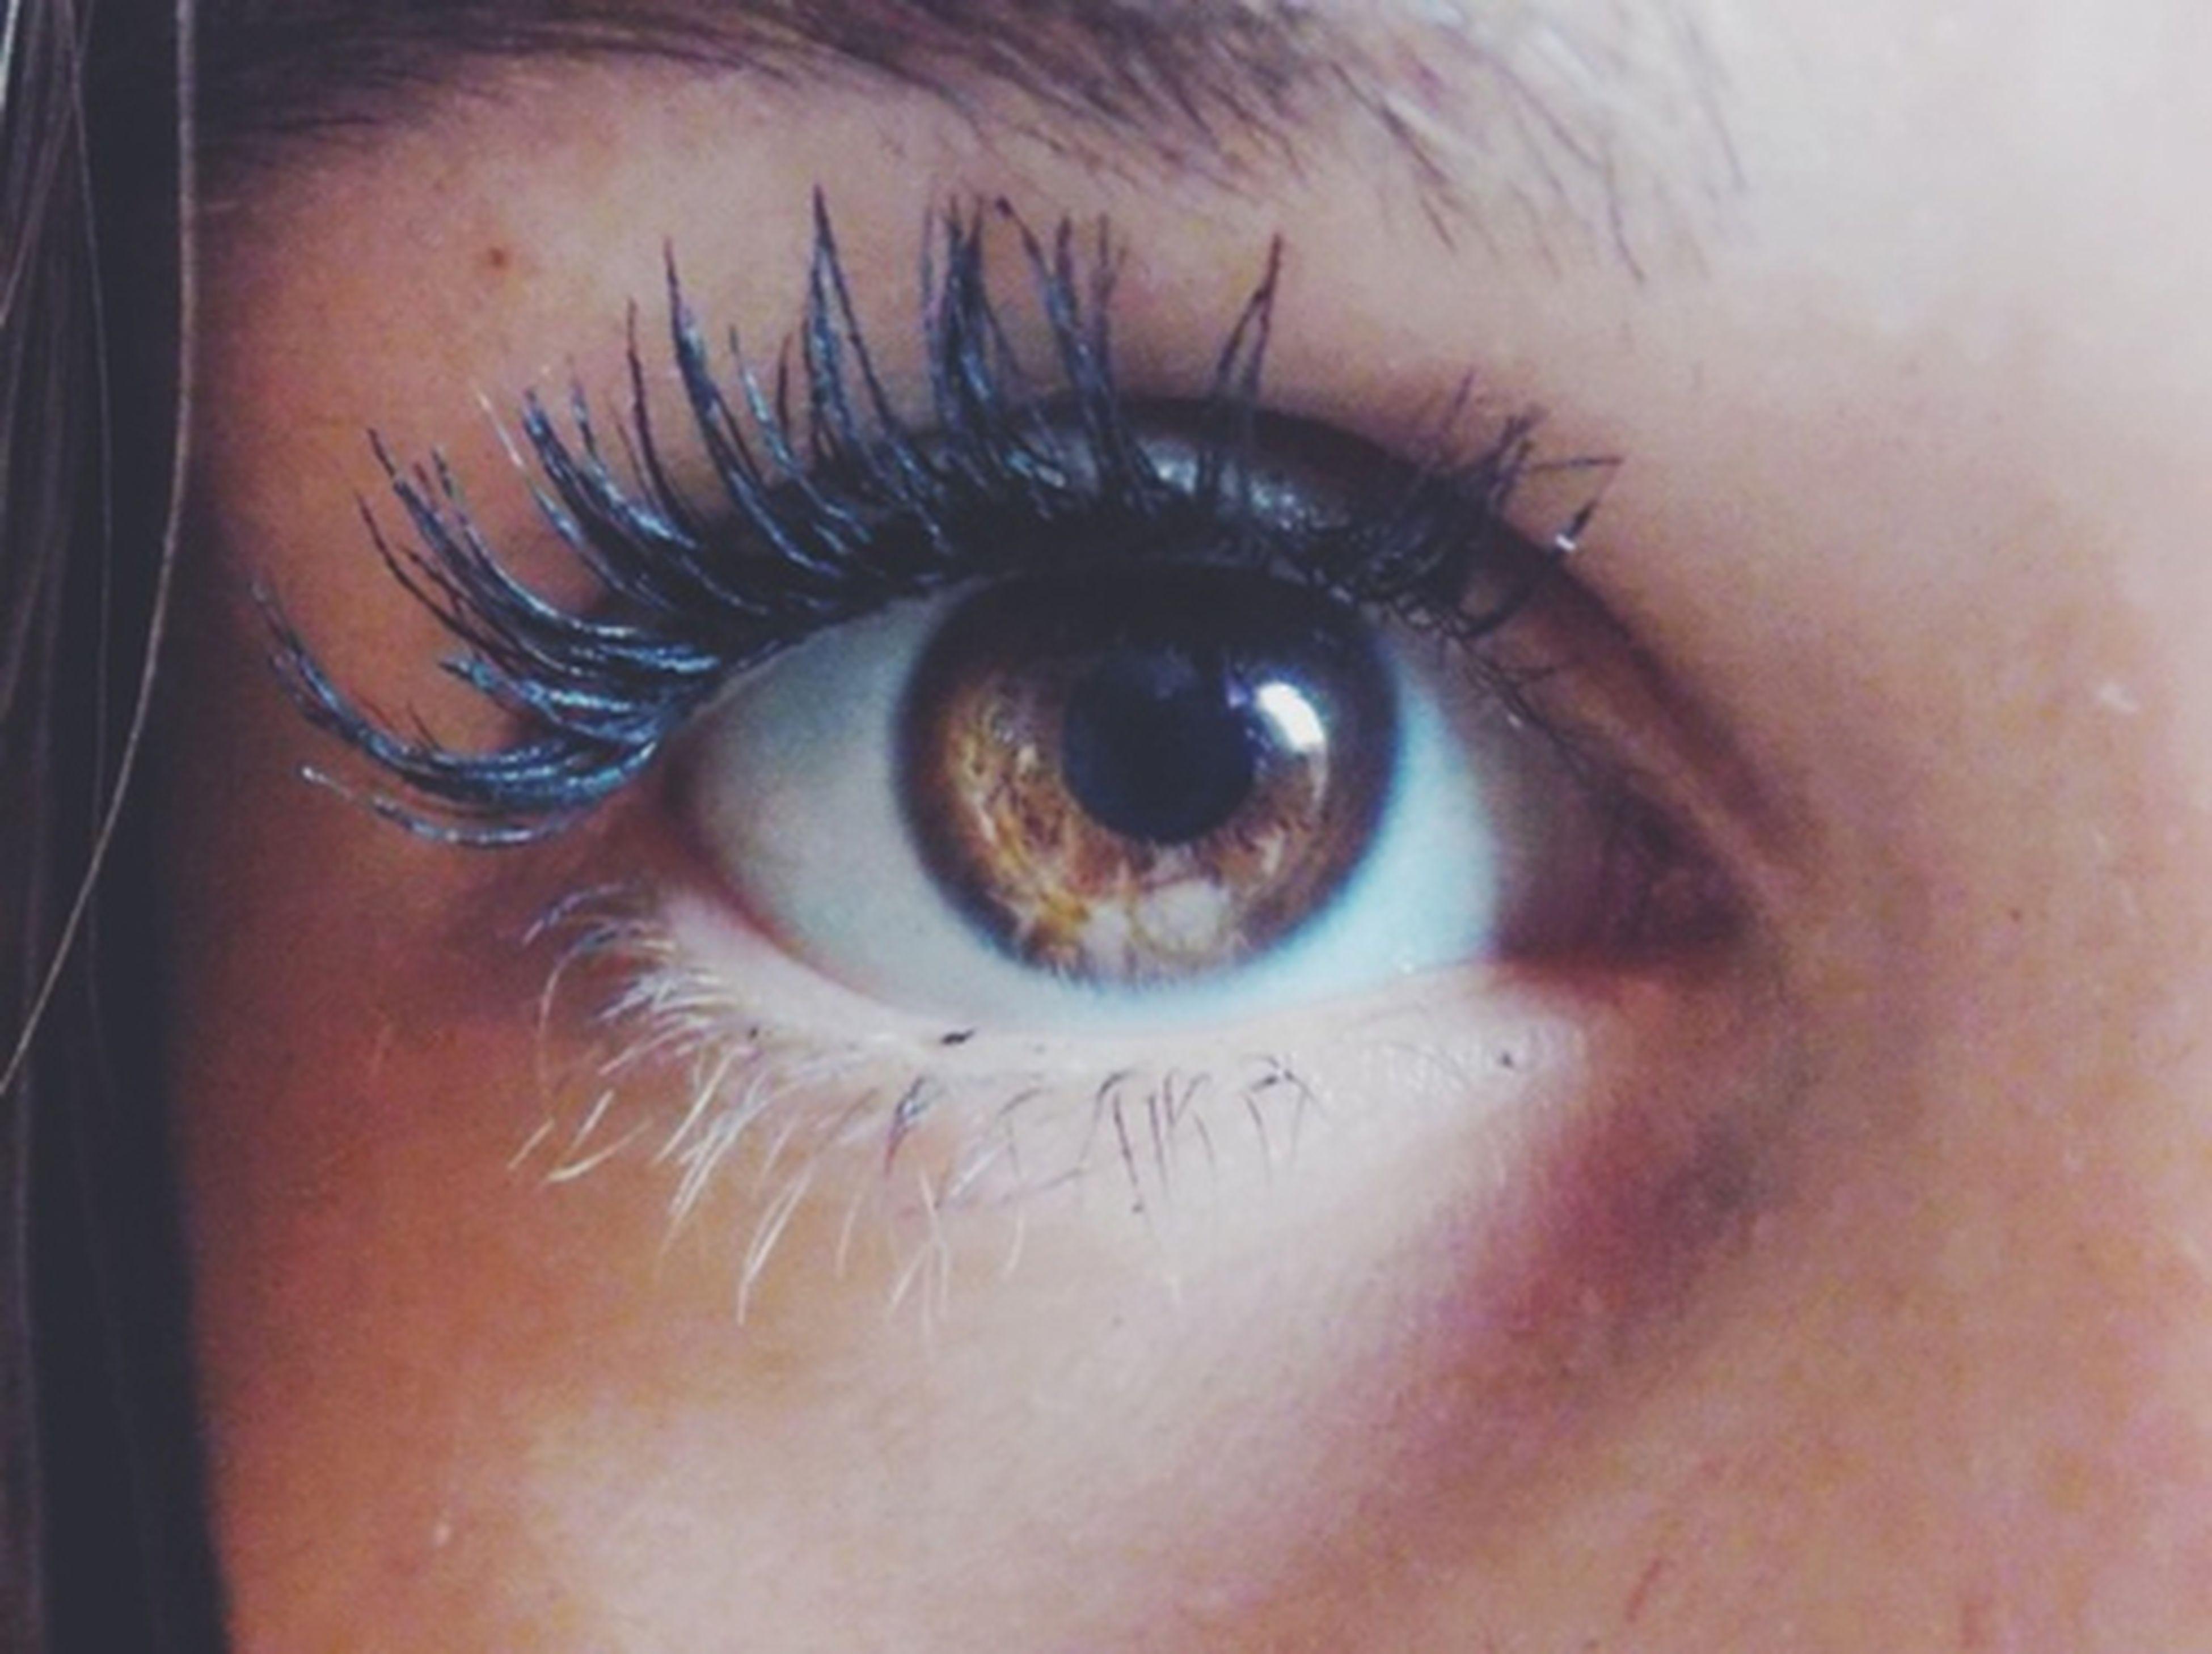 human eye, close-up, eyelash, eyesight, indoors, part of, human skin, sensory perception, extreme close-up, looking at camera, portrait, human face, iris - eye, lifestyles, eyeball, person, unrecognizable person